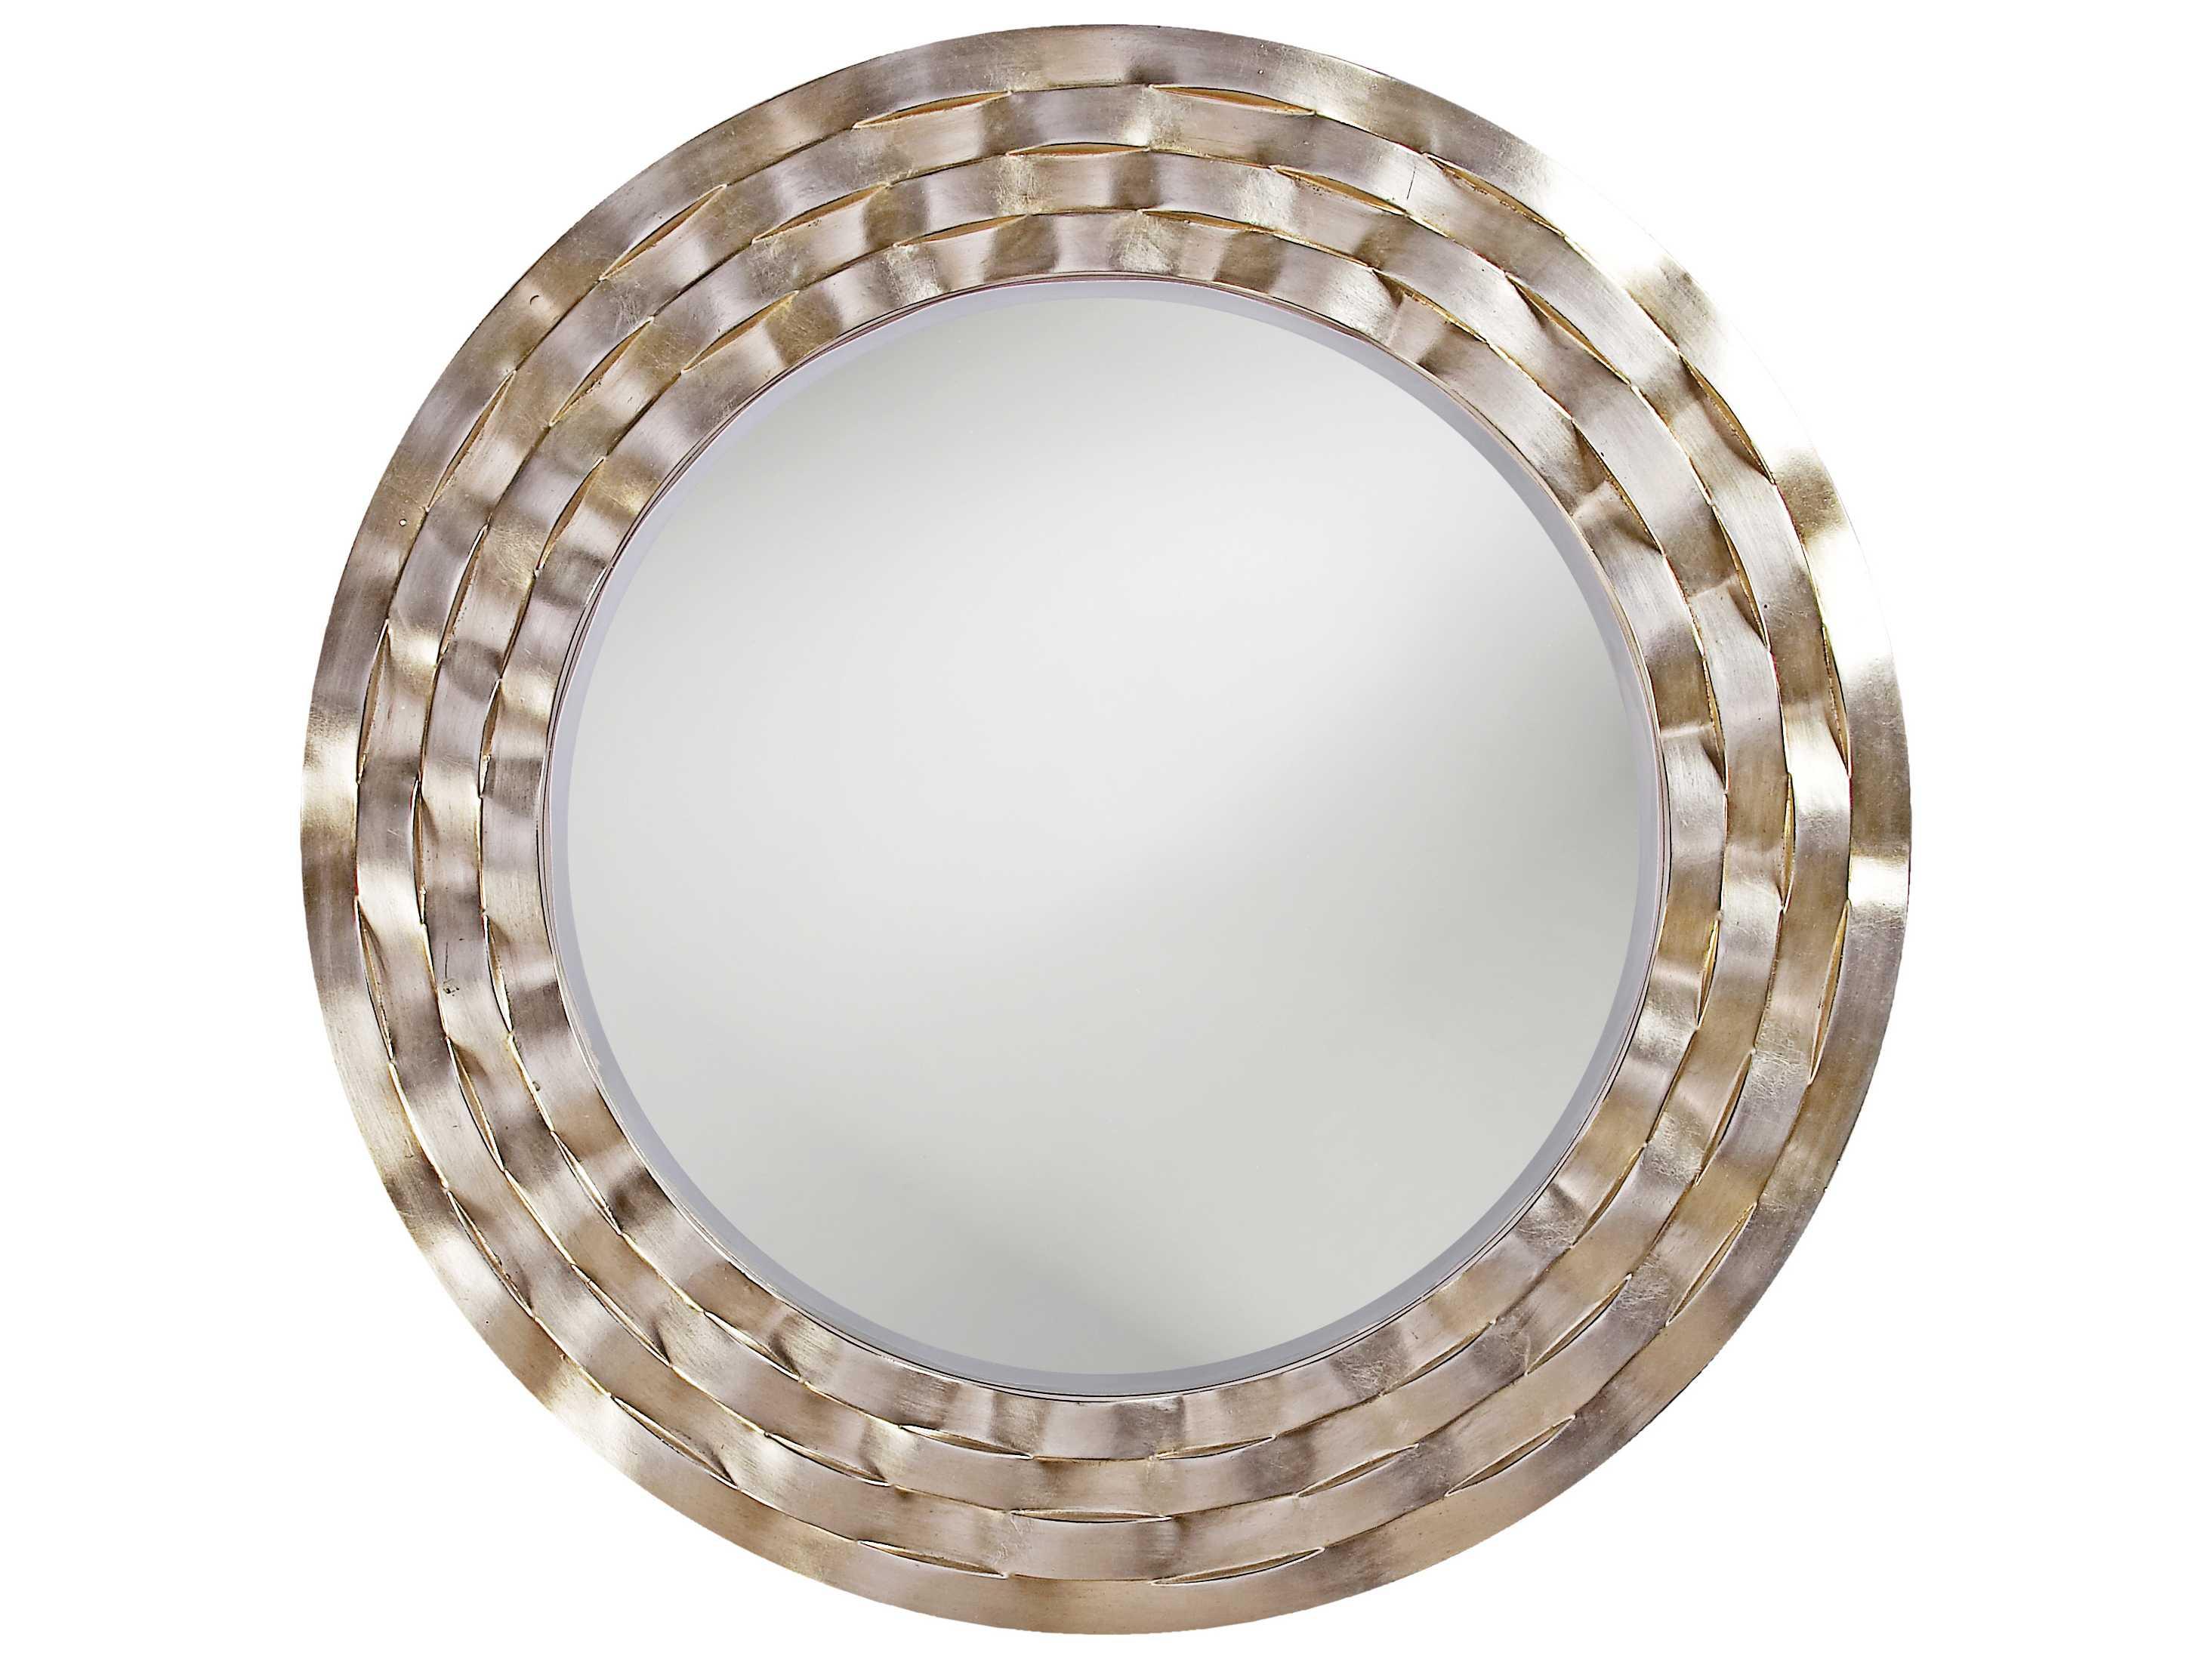 Howard elliott cartier 46 round silver wall mirror he2140 for Round silver wall mirror